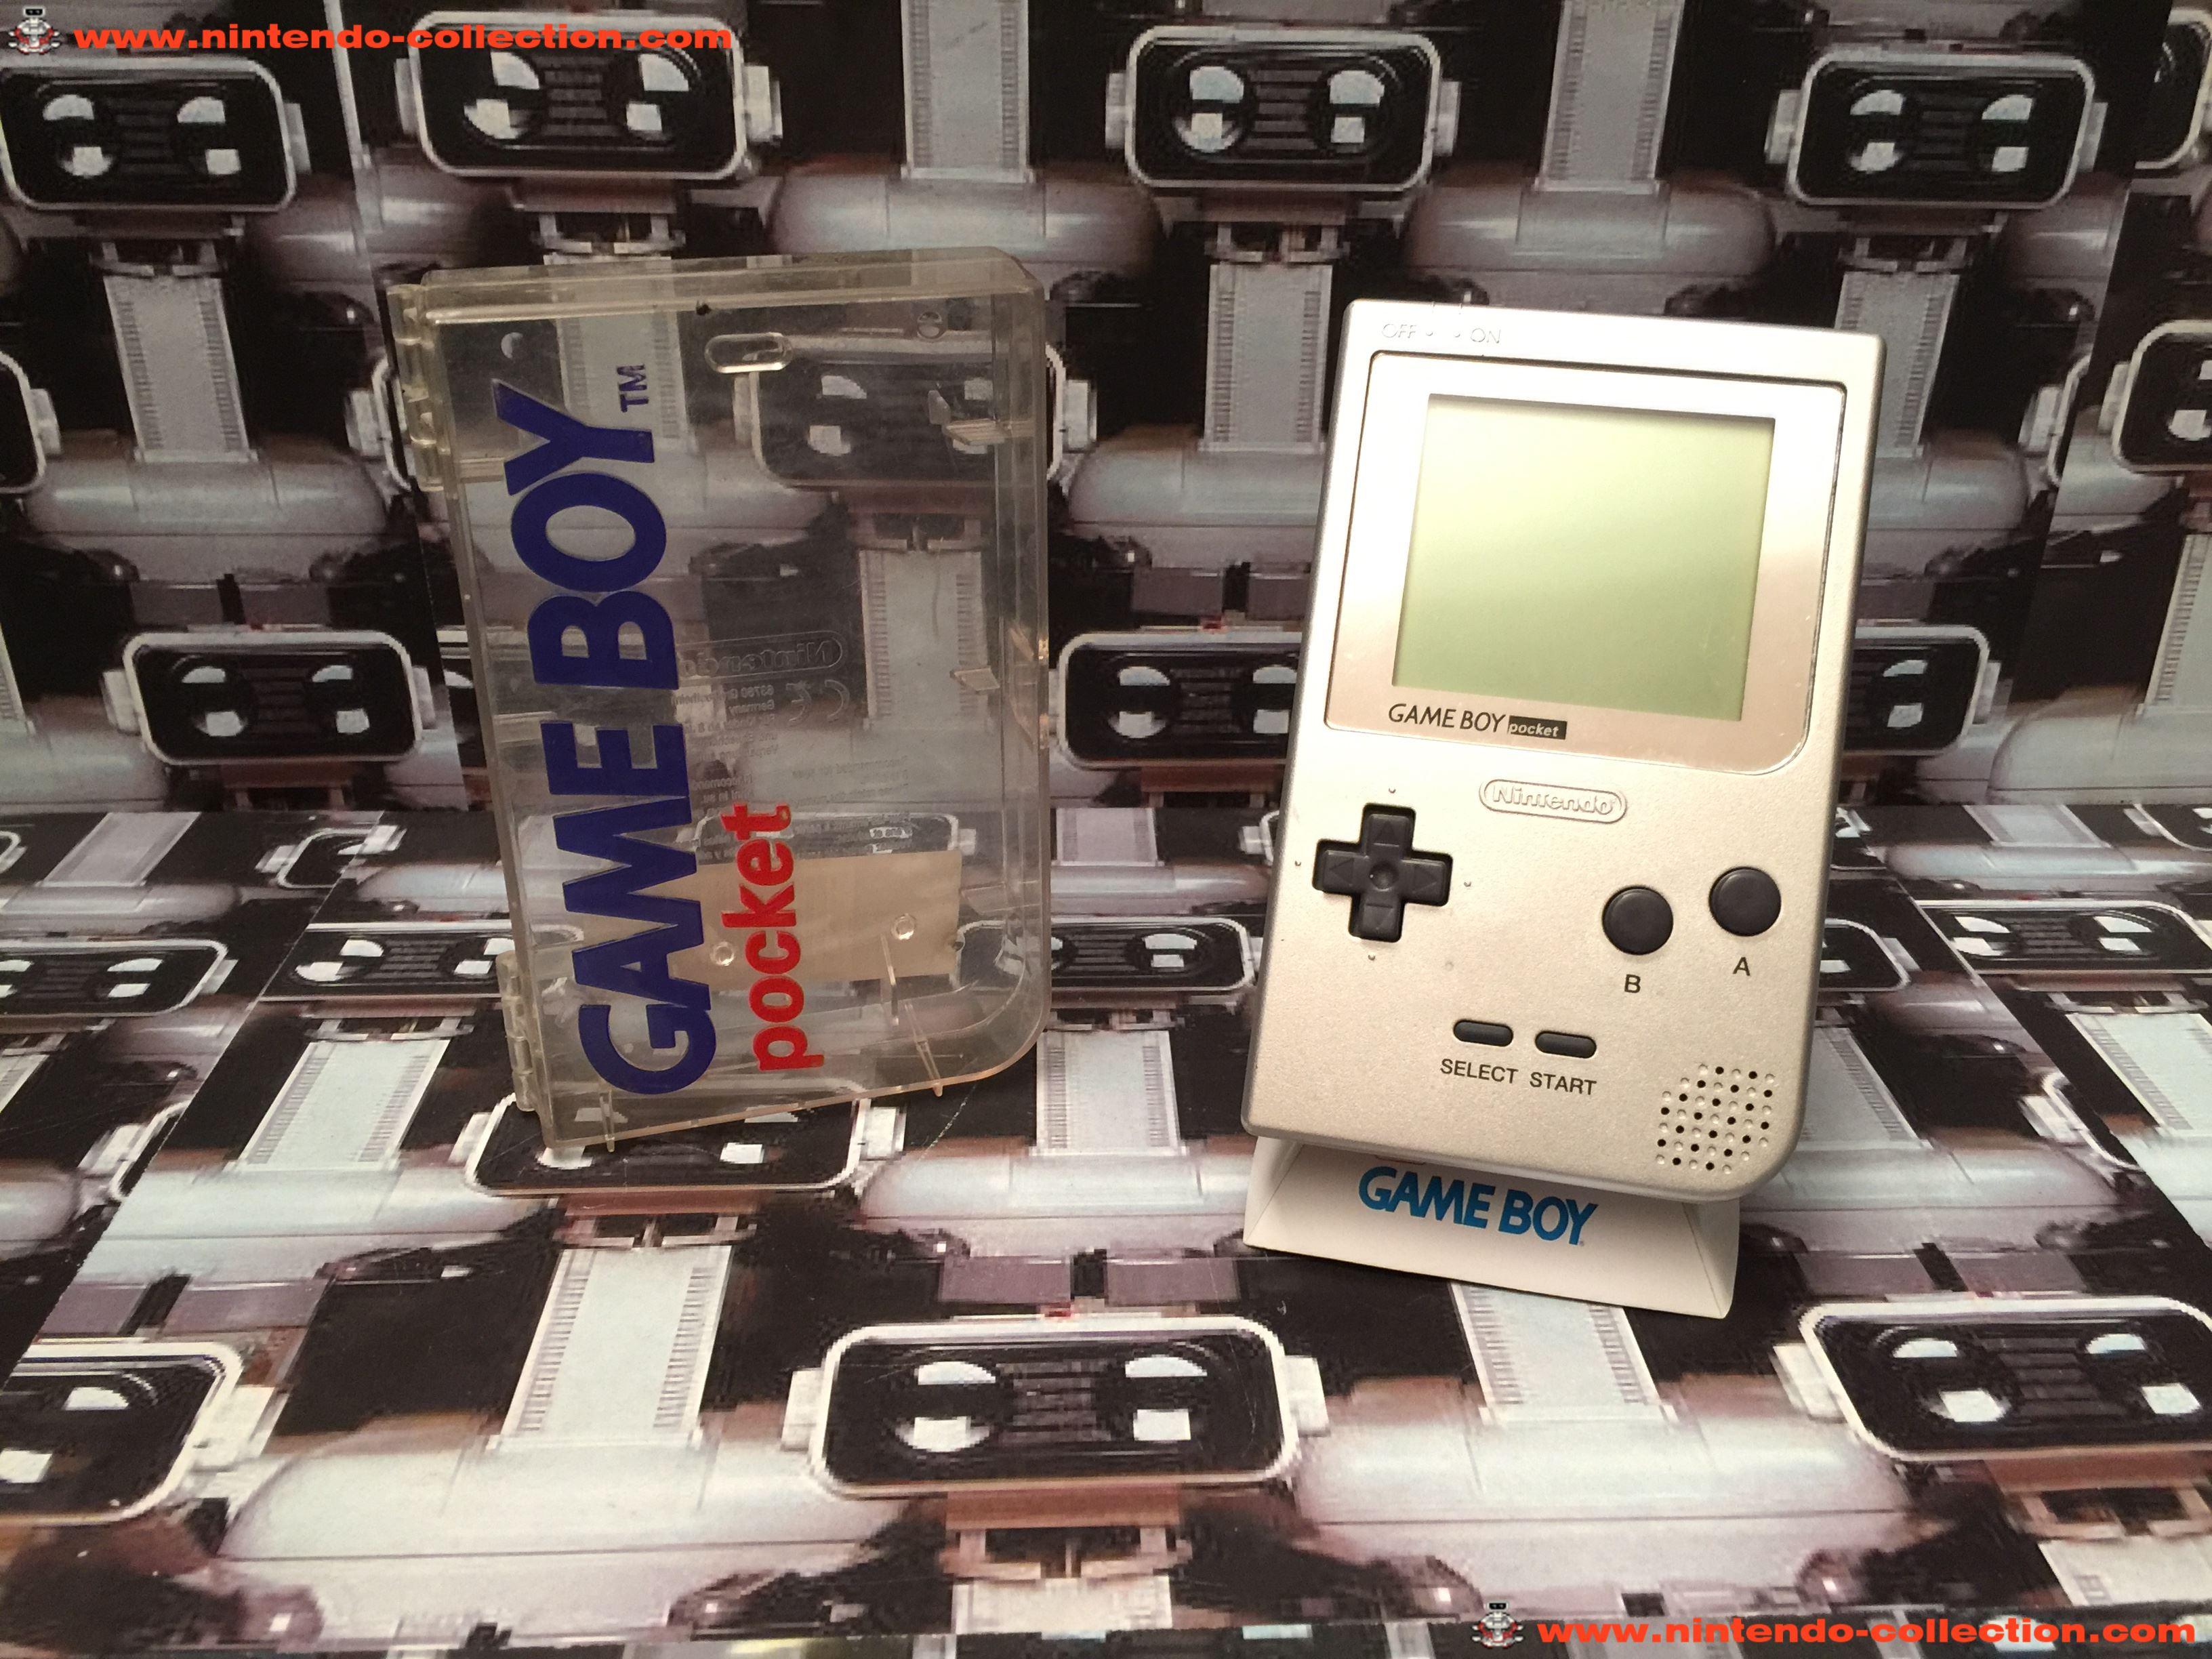 www.nintendo-collection.com - Gameboy Pocket GB Silver Argent Grise ecran chrome No LED - 01